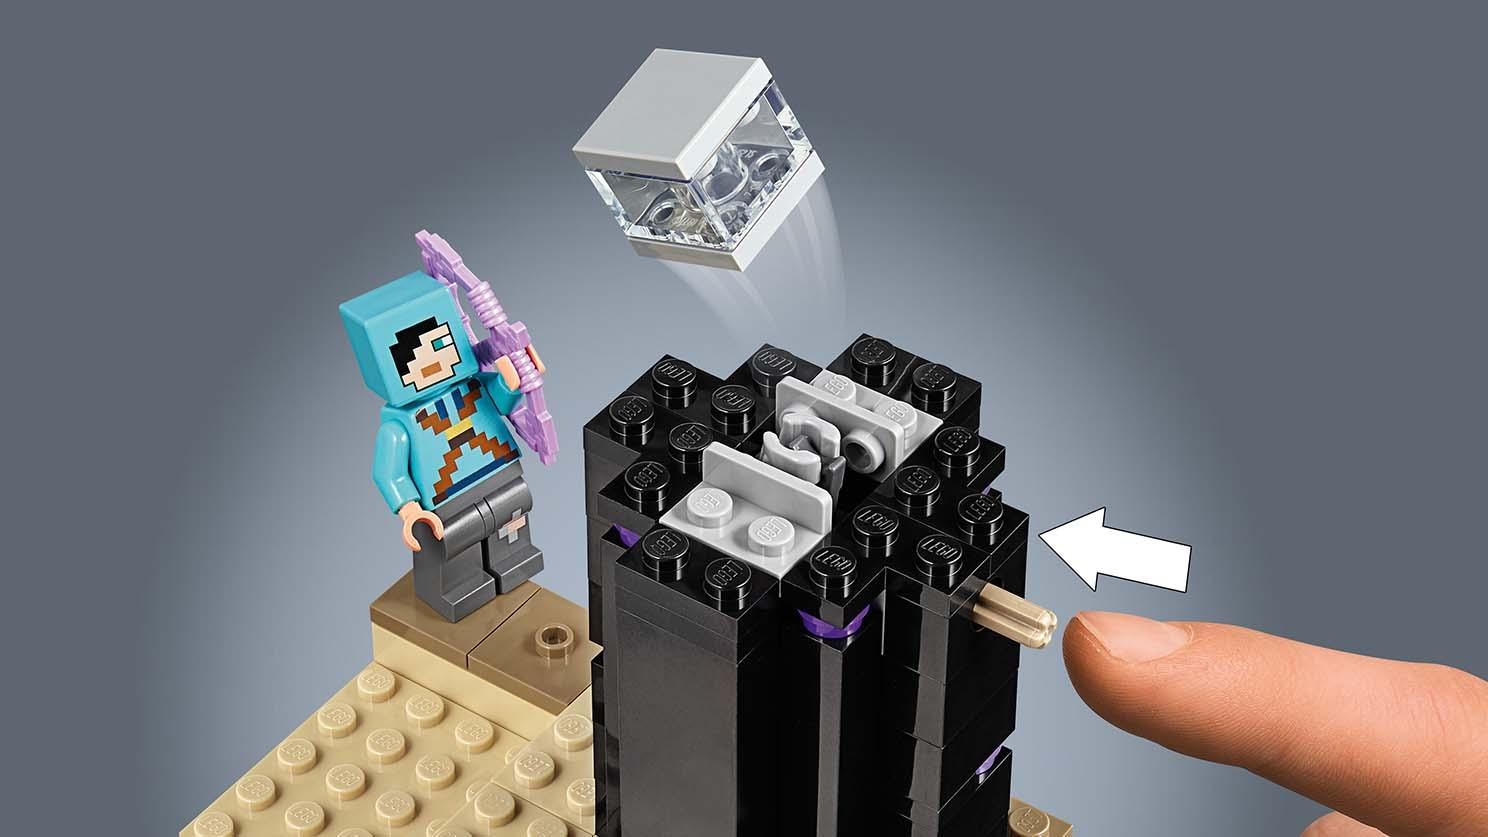 The End Battle 21151 Lego Minecraft Sets Lego Com For Kids Us